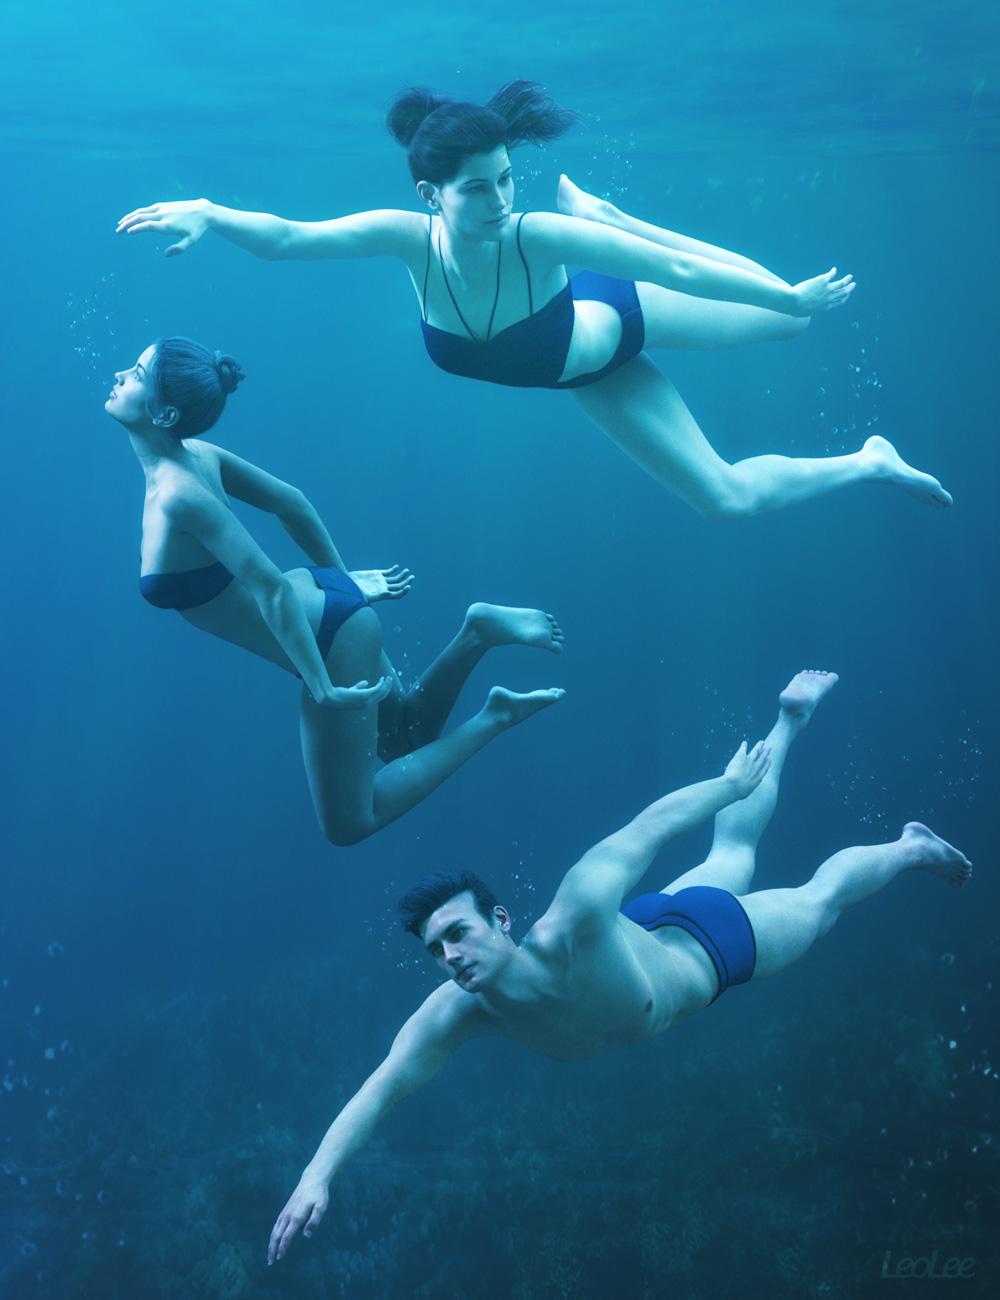 Underwater Poses for Genesis 3 & 8 by: Leo Lee, 3D Models by Daz 3D